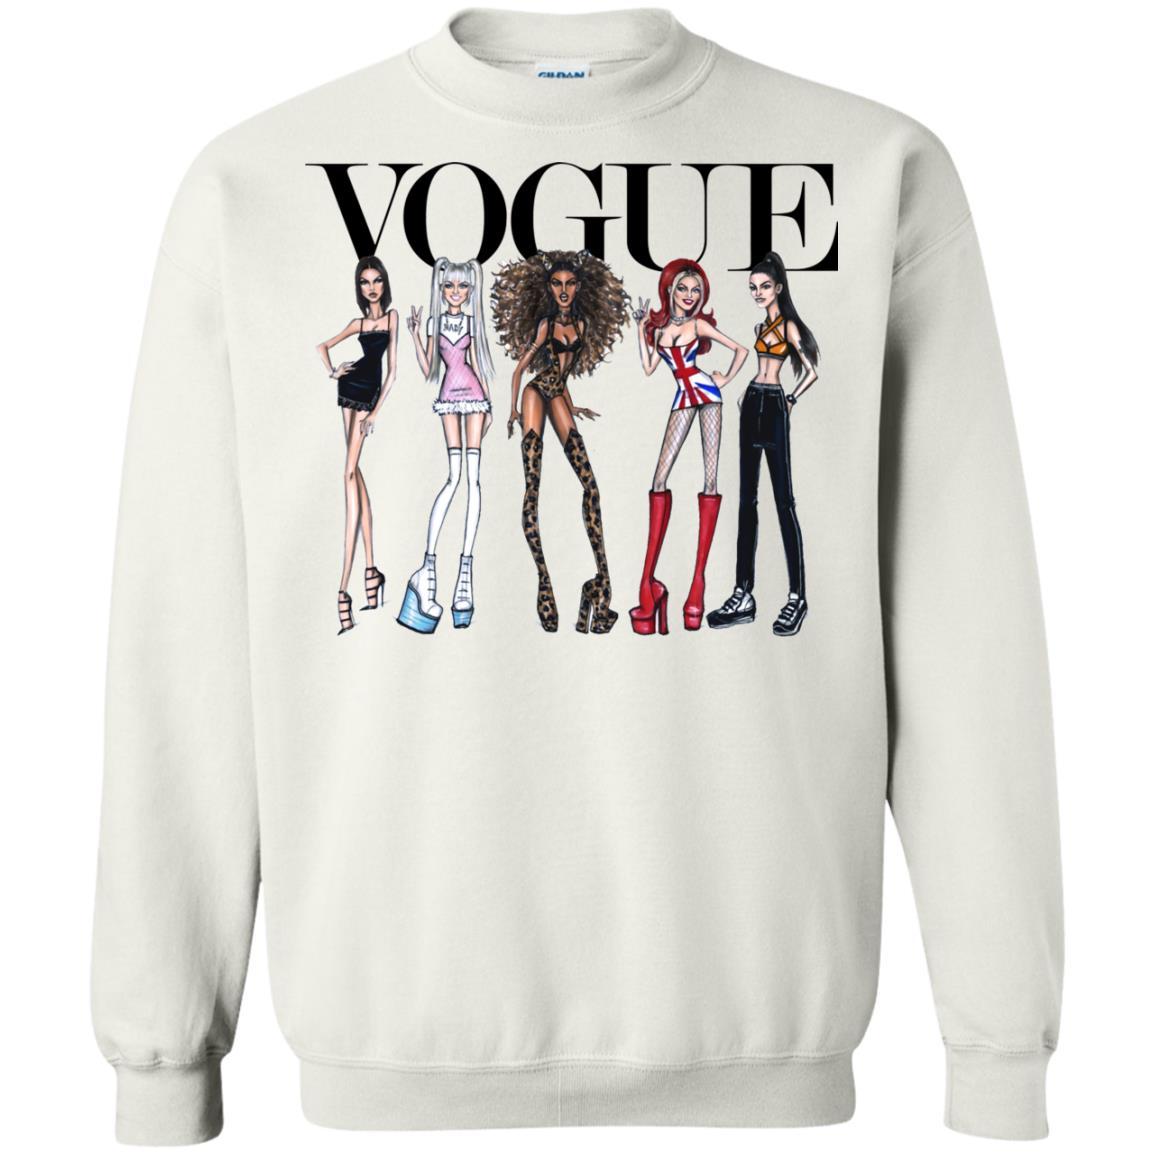 image 4434 - Spice Girls Vogue shirt, sweater